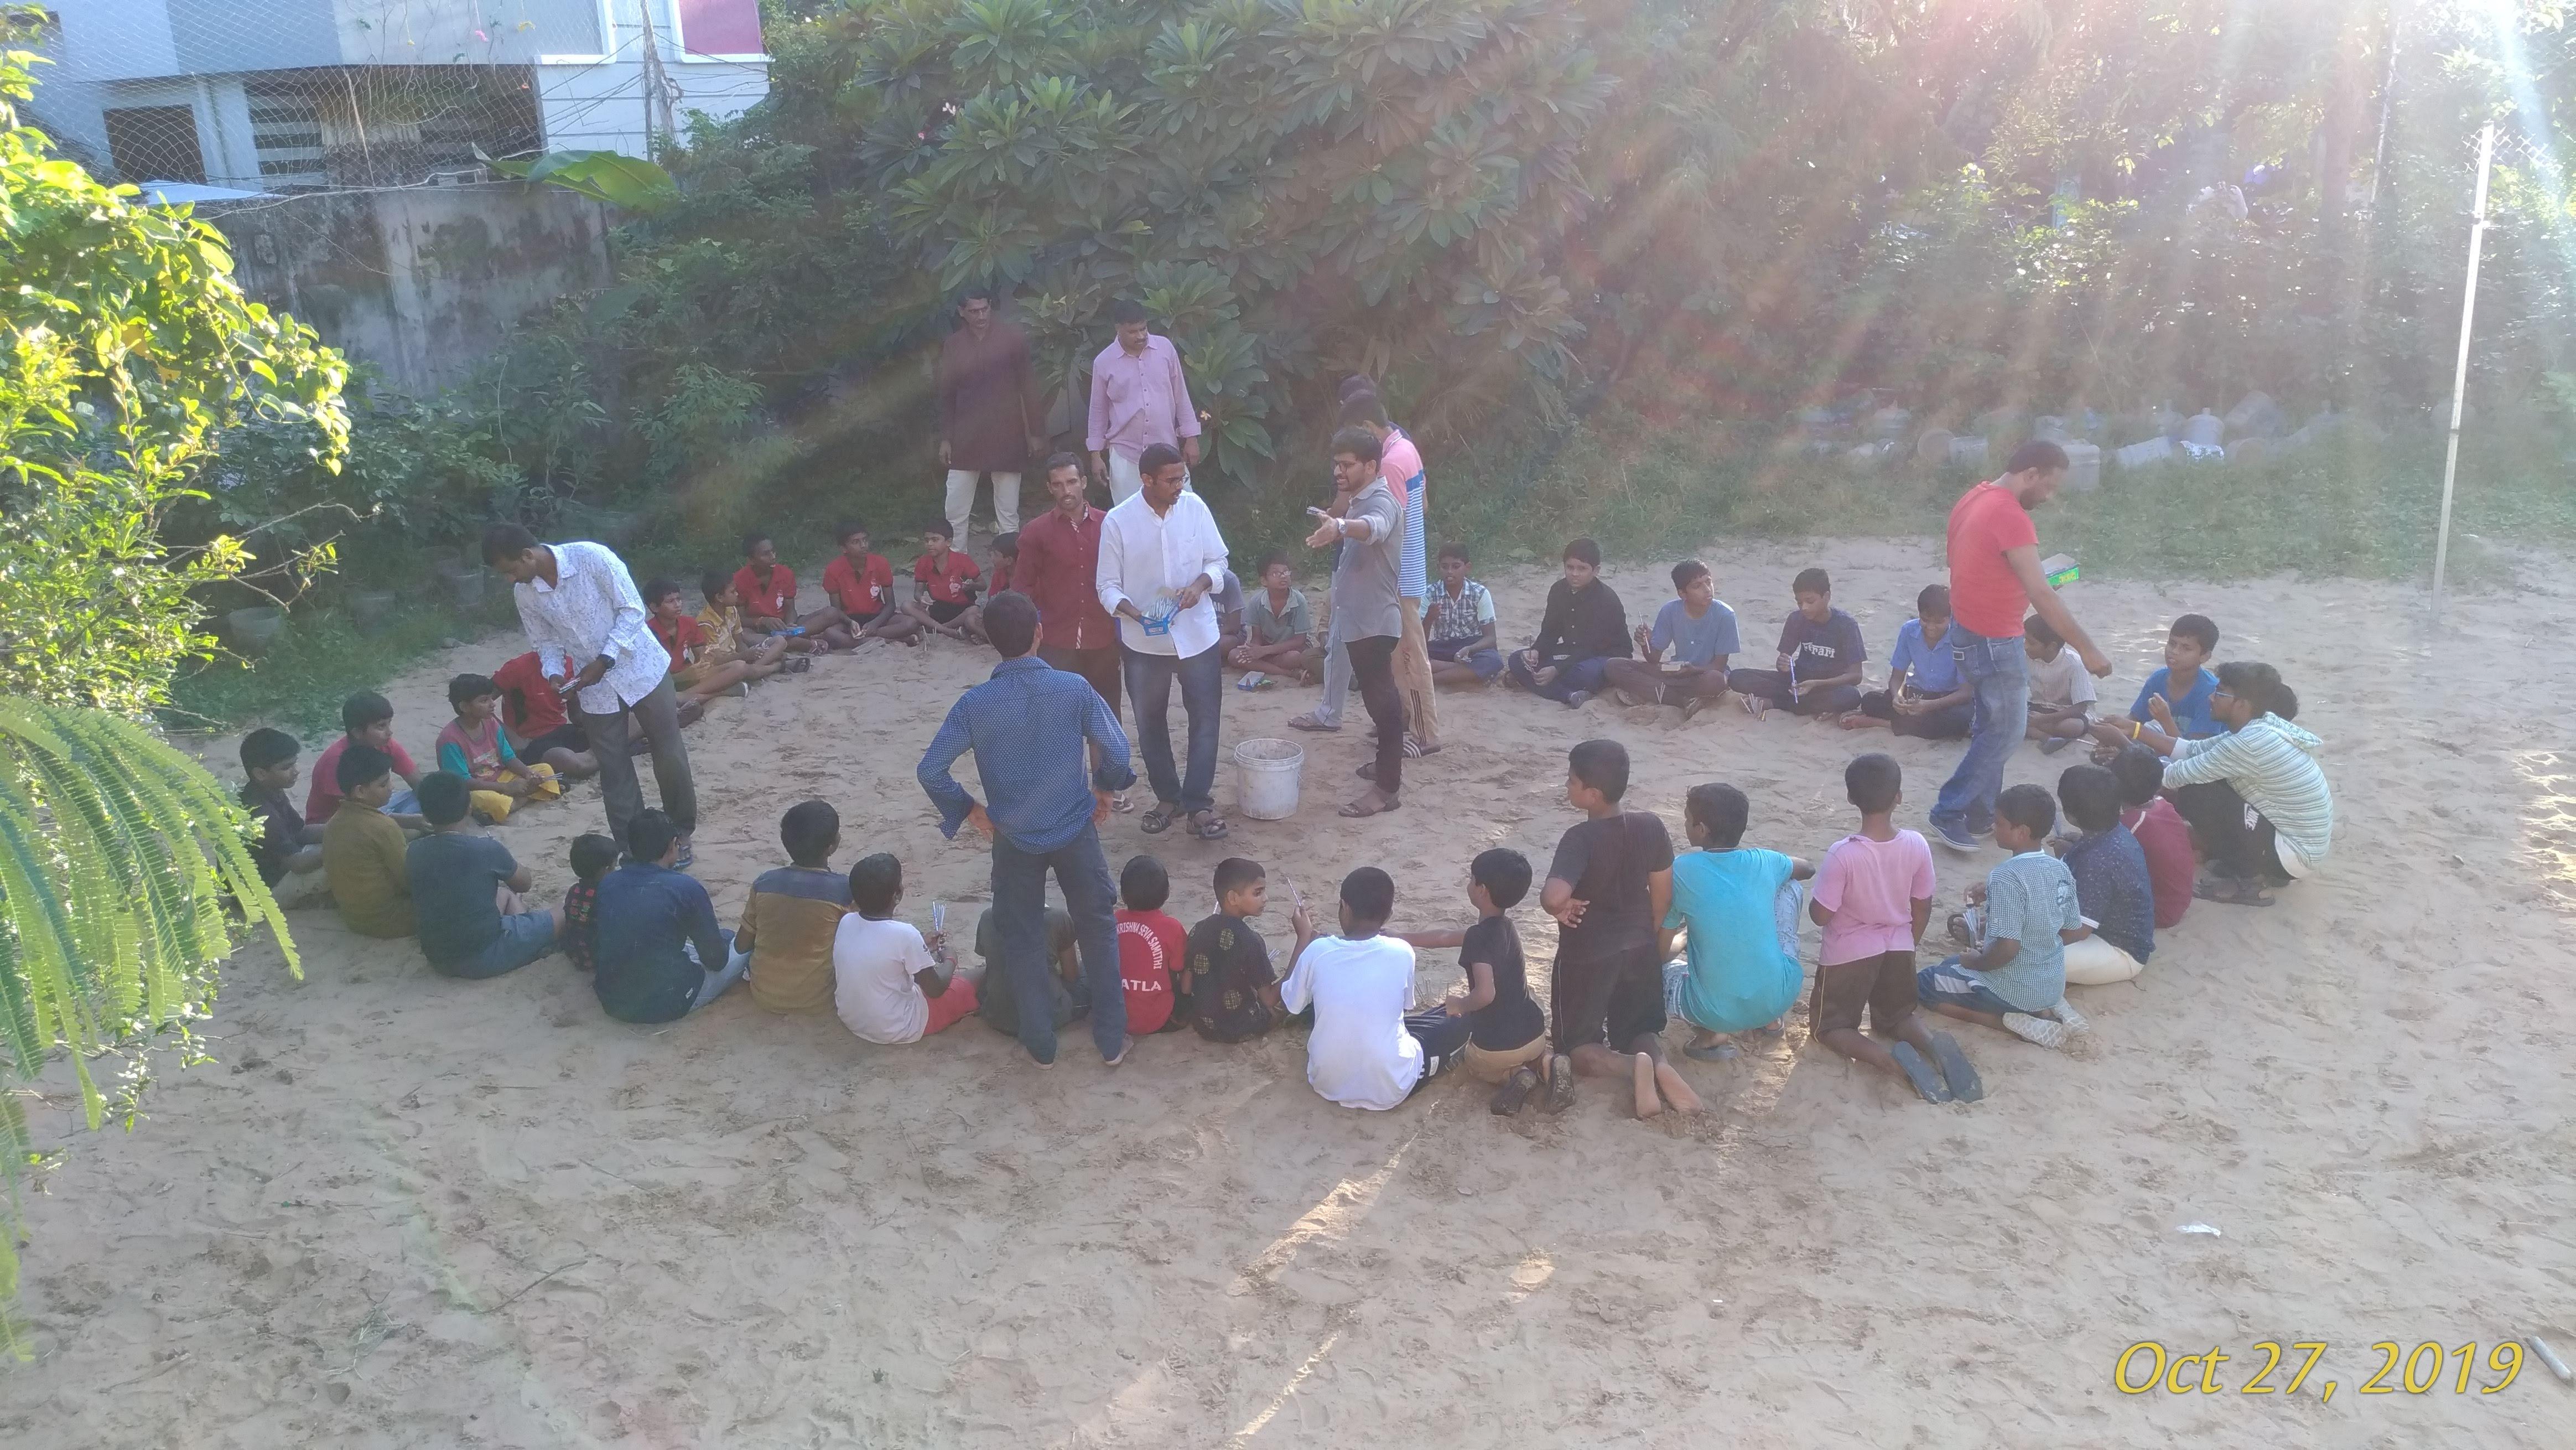 Childrens playing